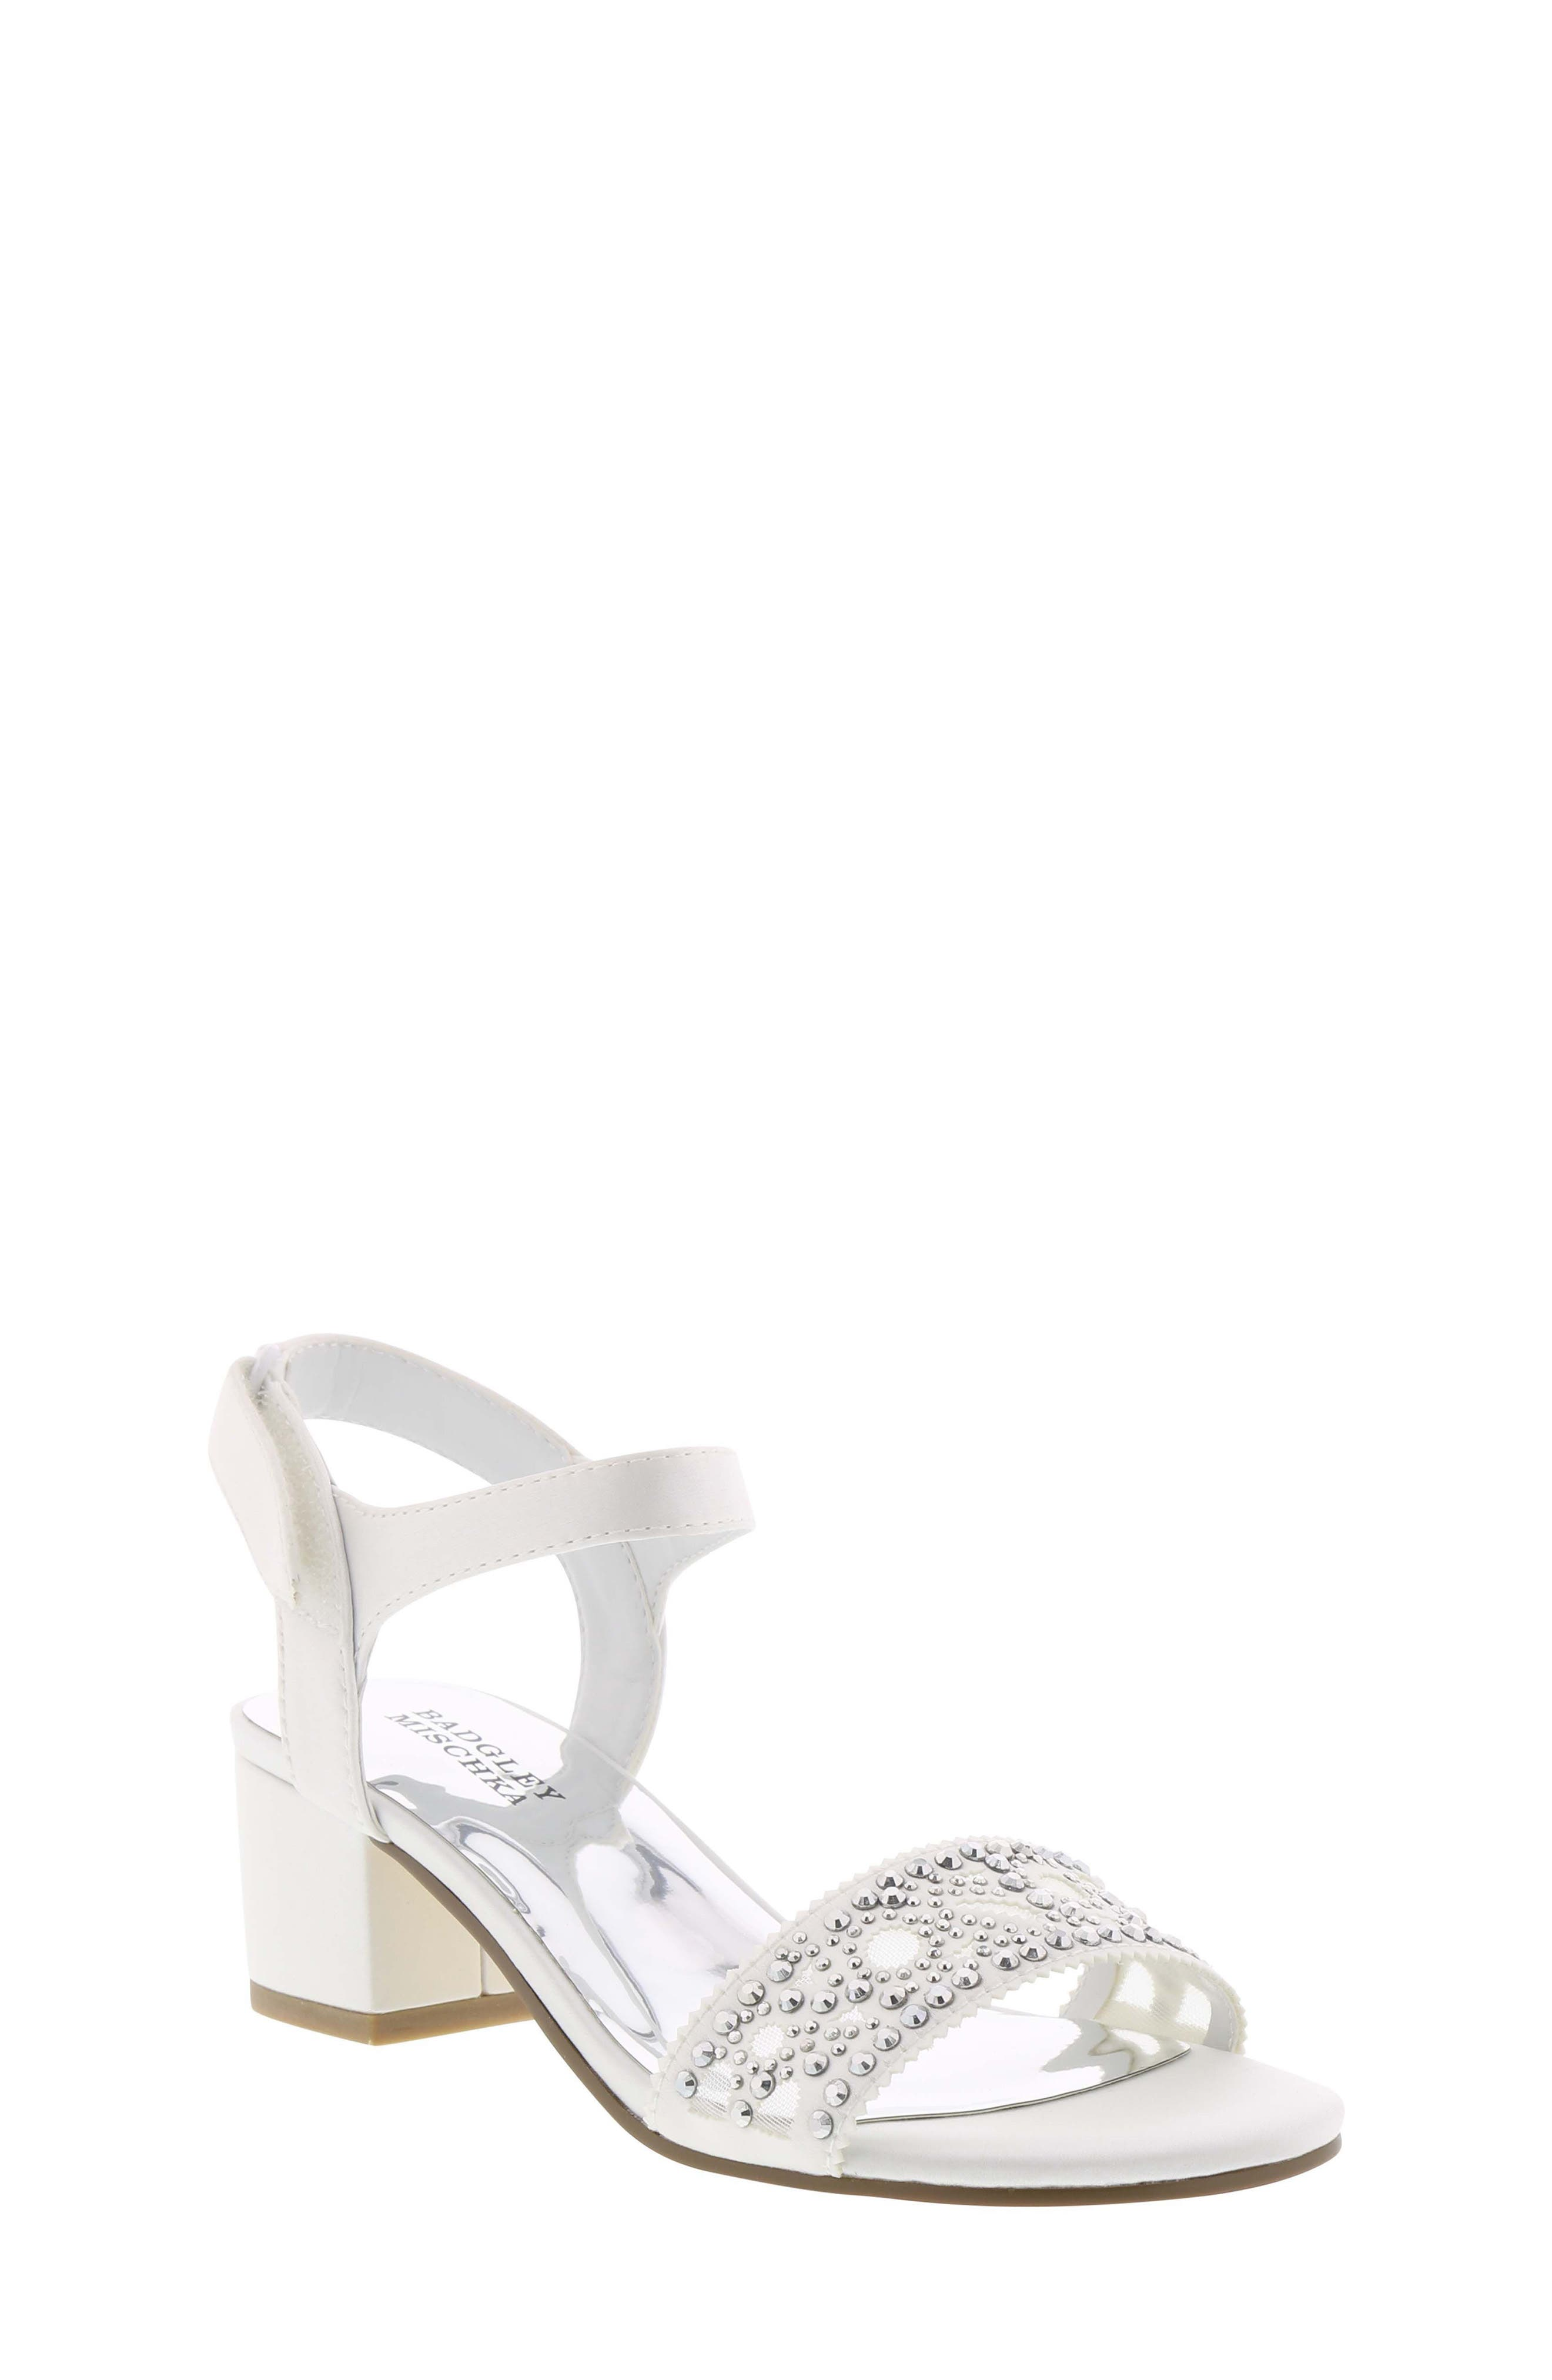 Ascot Gems Sandal,                         Main,                         color, 100